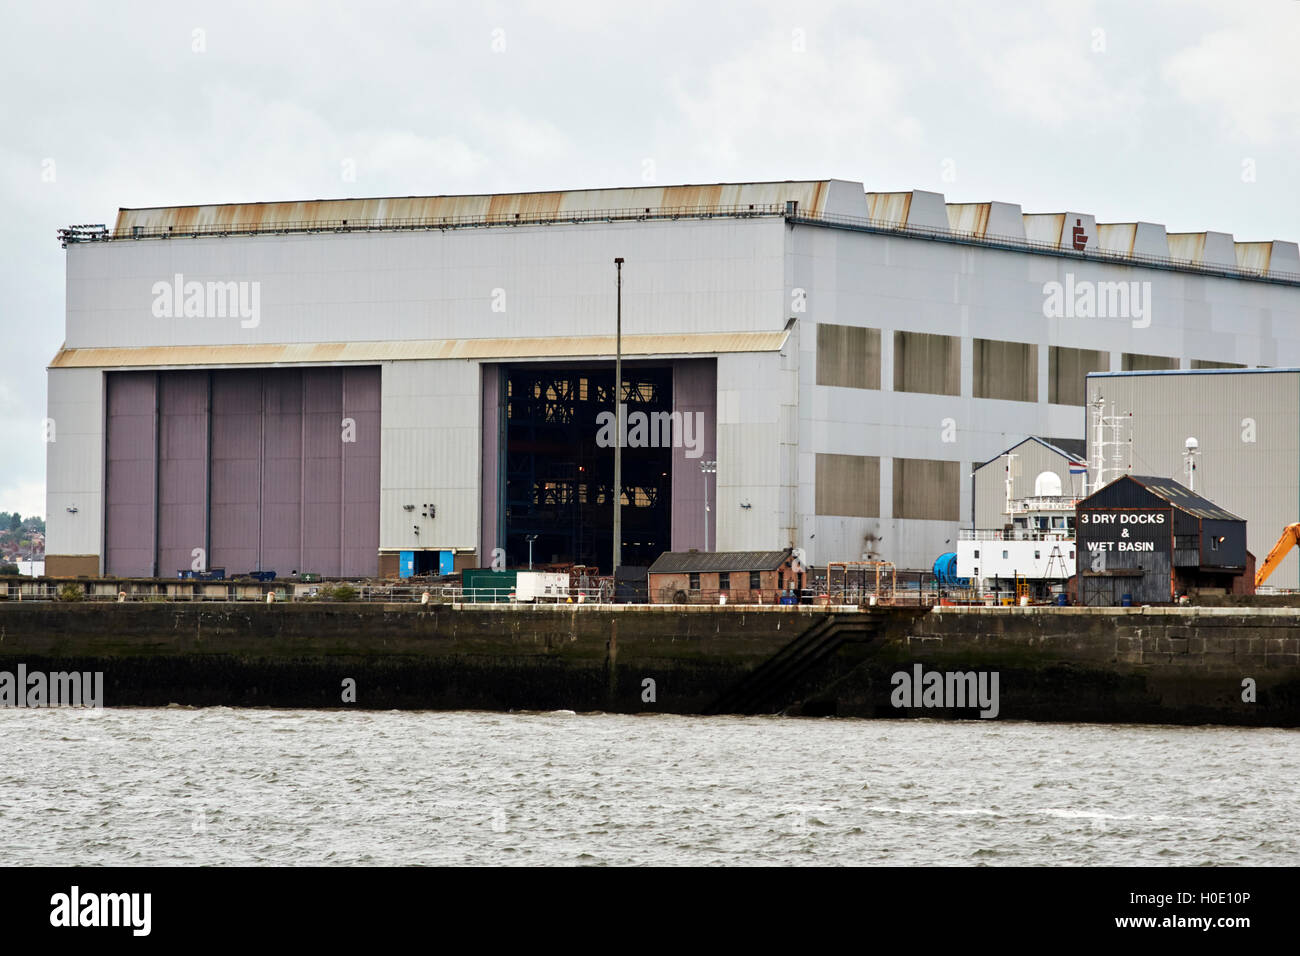 Edificio submarino astillero Cammell Laird en Birkenhead hall Liverpool Merseyside UK Imagen De Stock